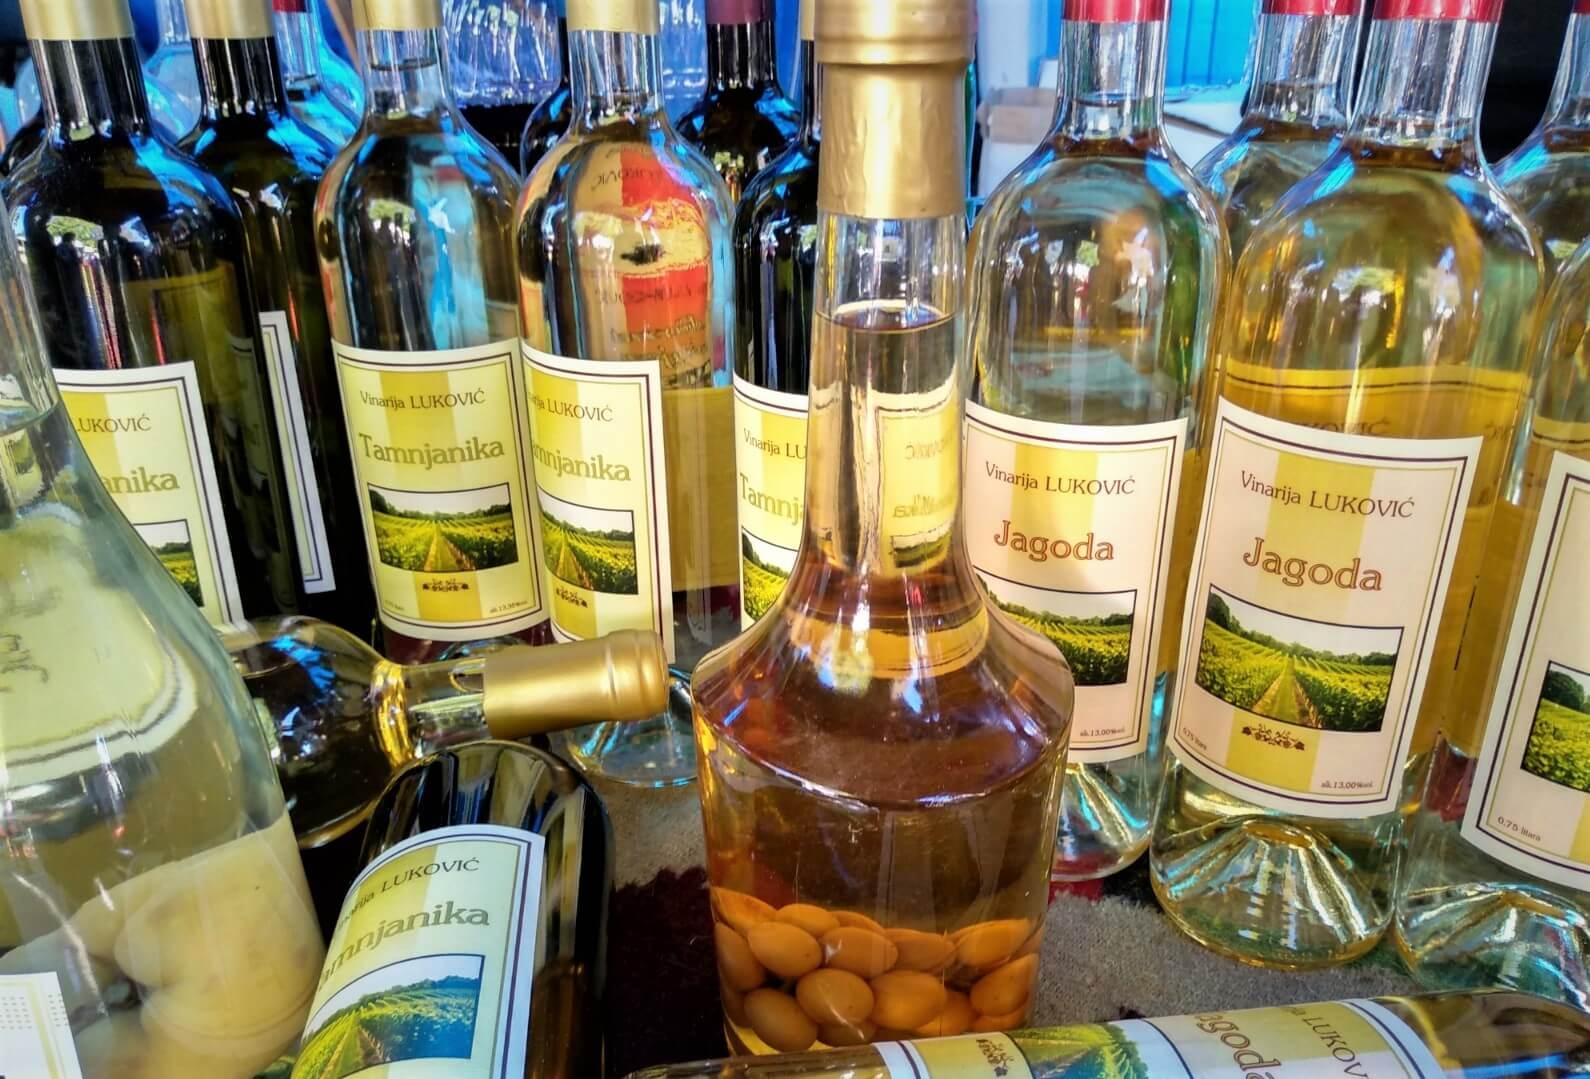 vino jagoda